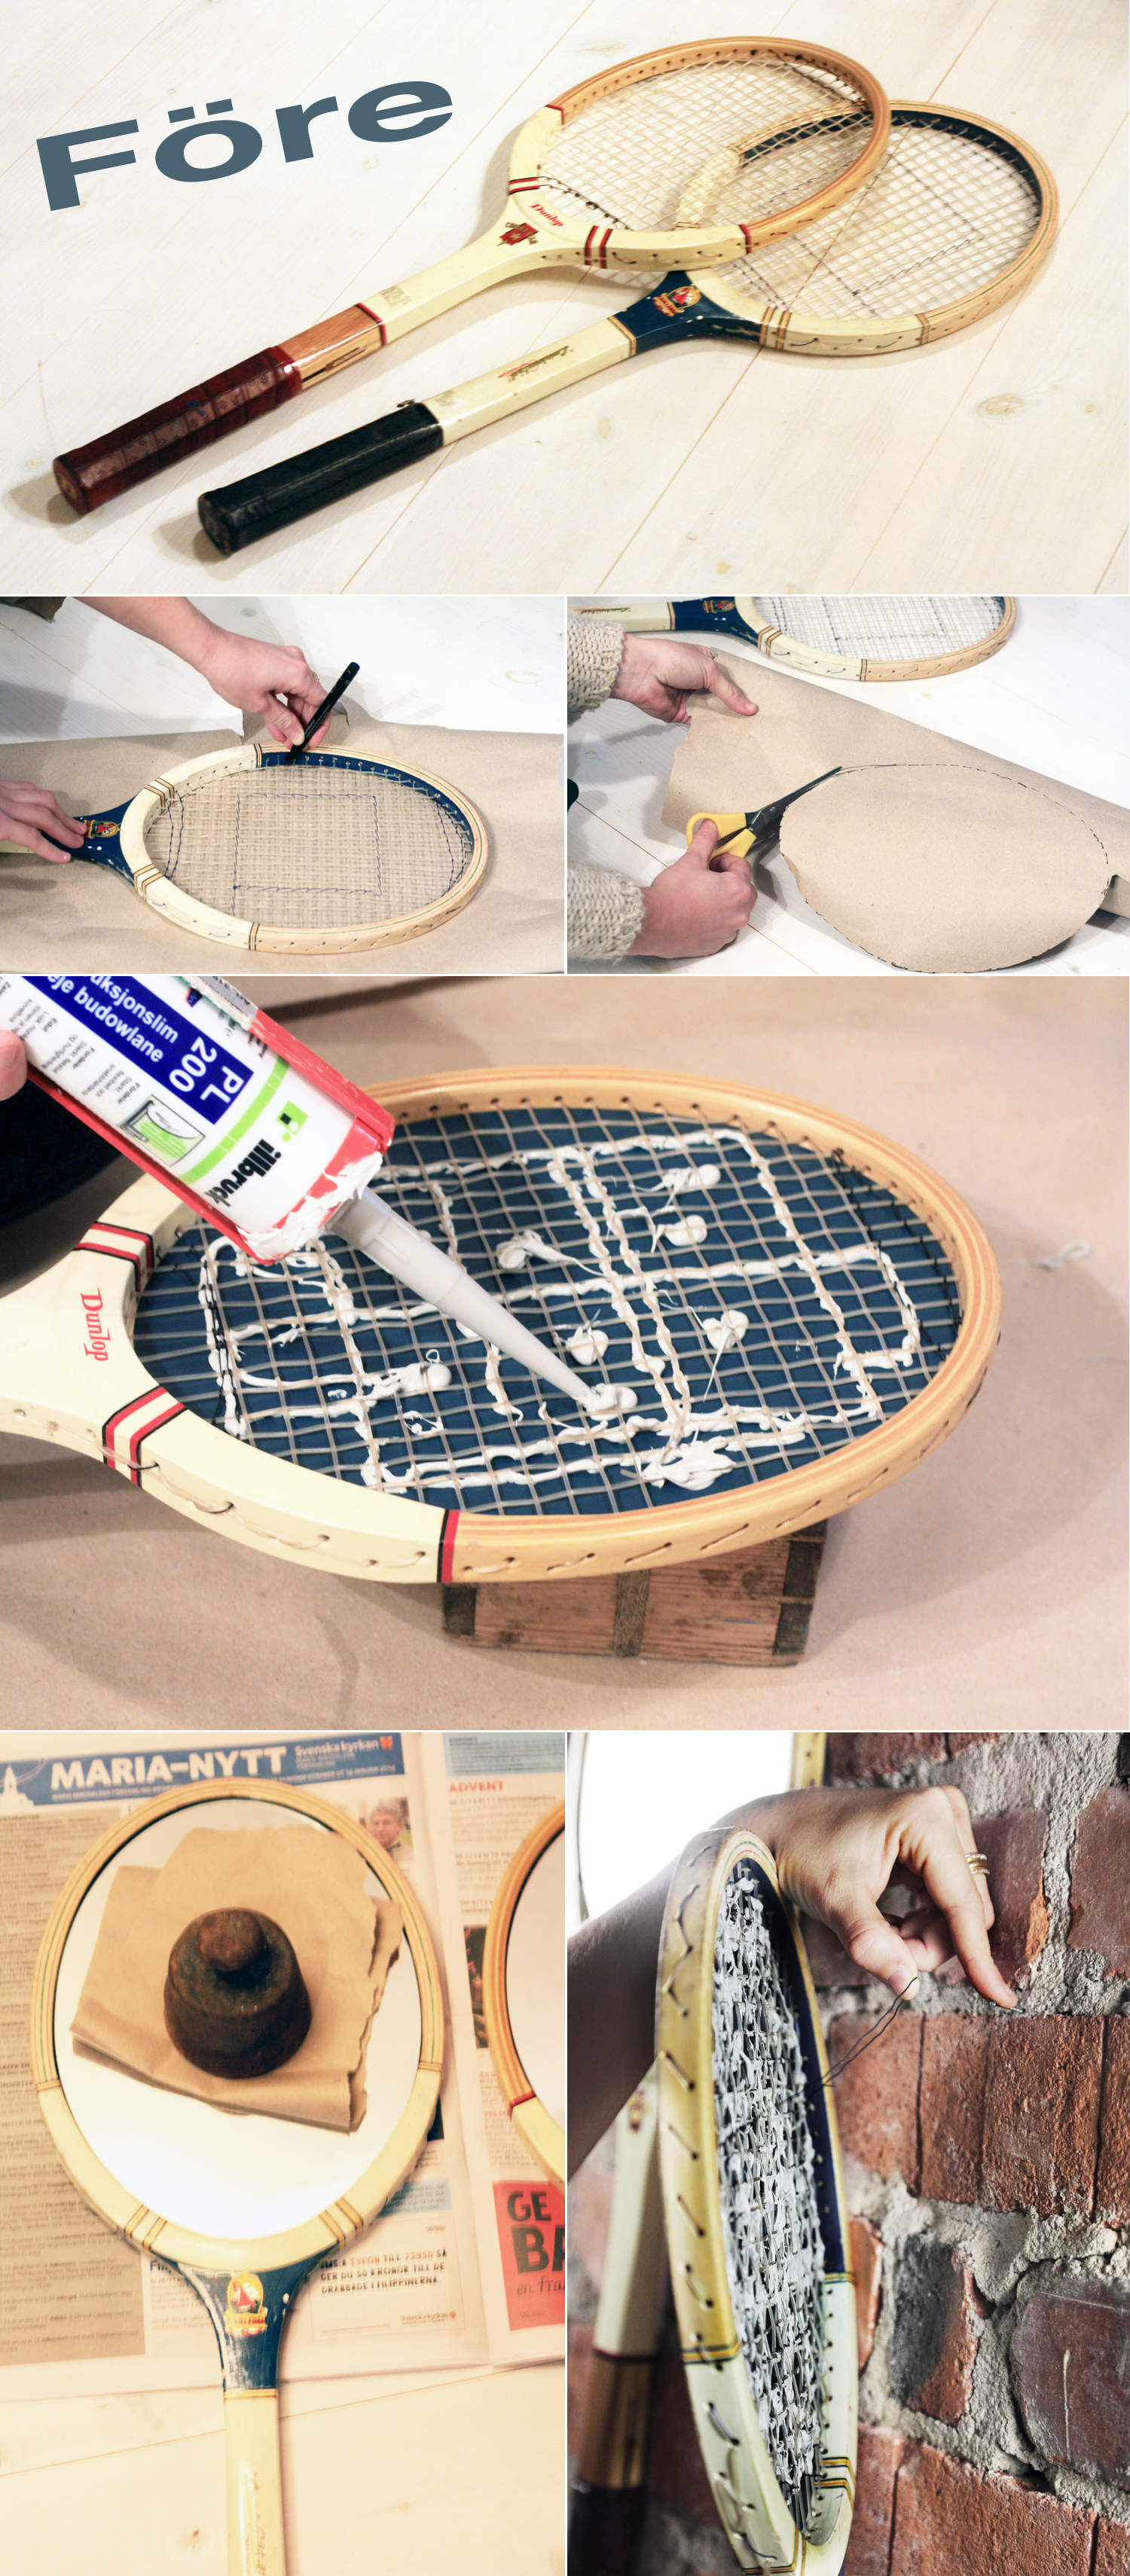 monica.karlstein.racket.racet.tennis-mirror-spegel-upcycling